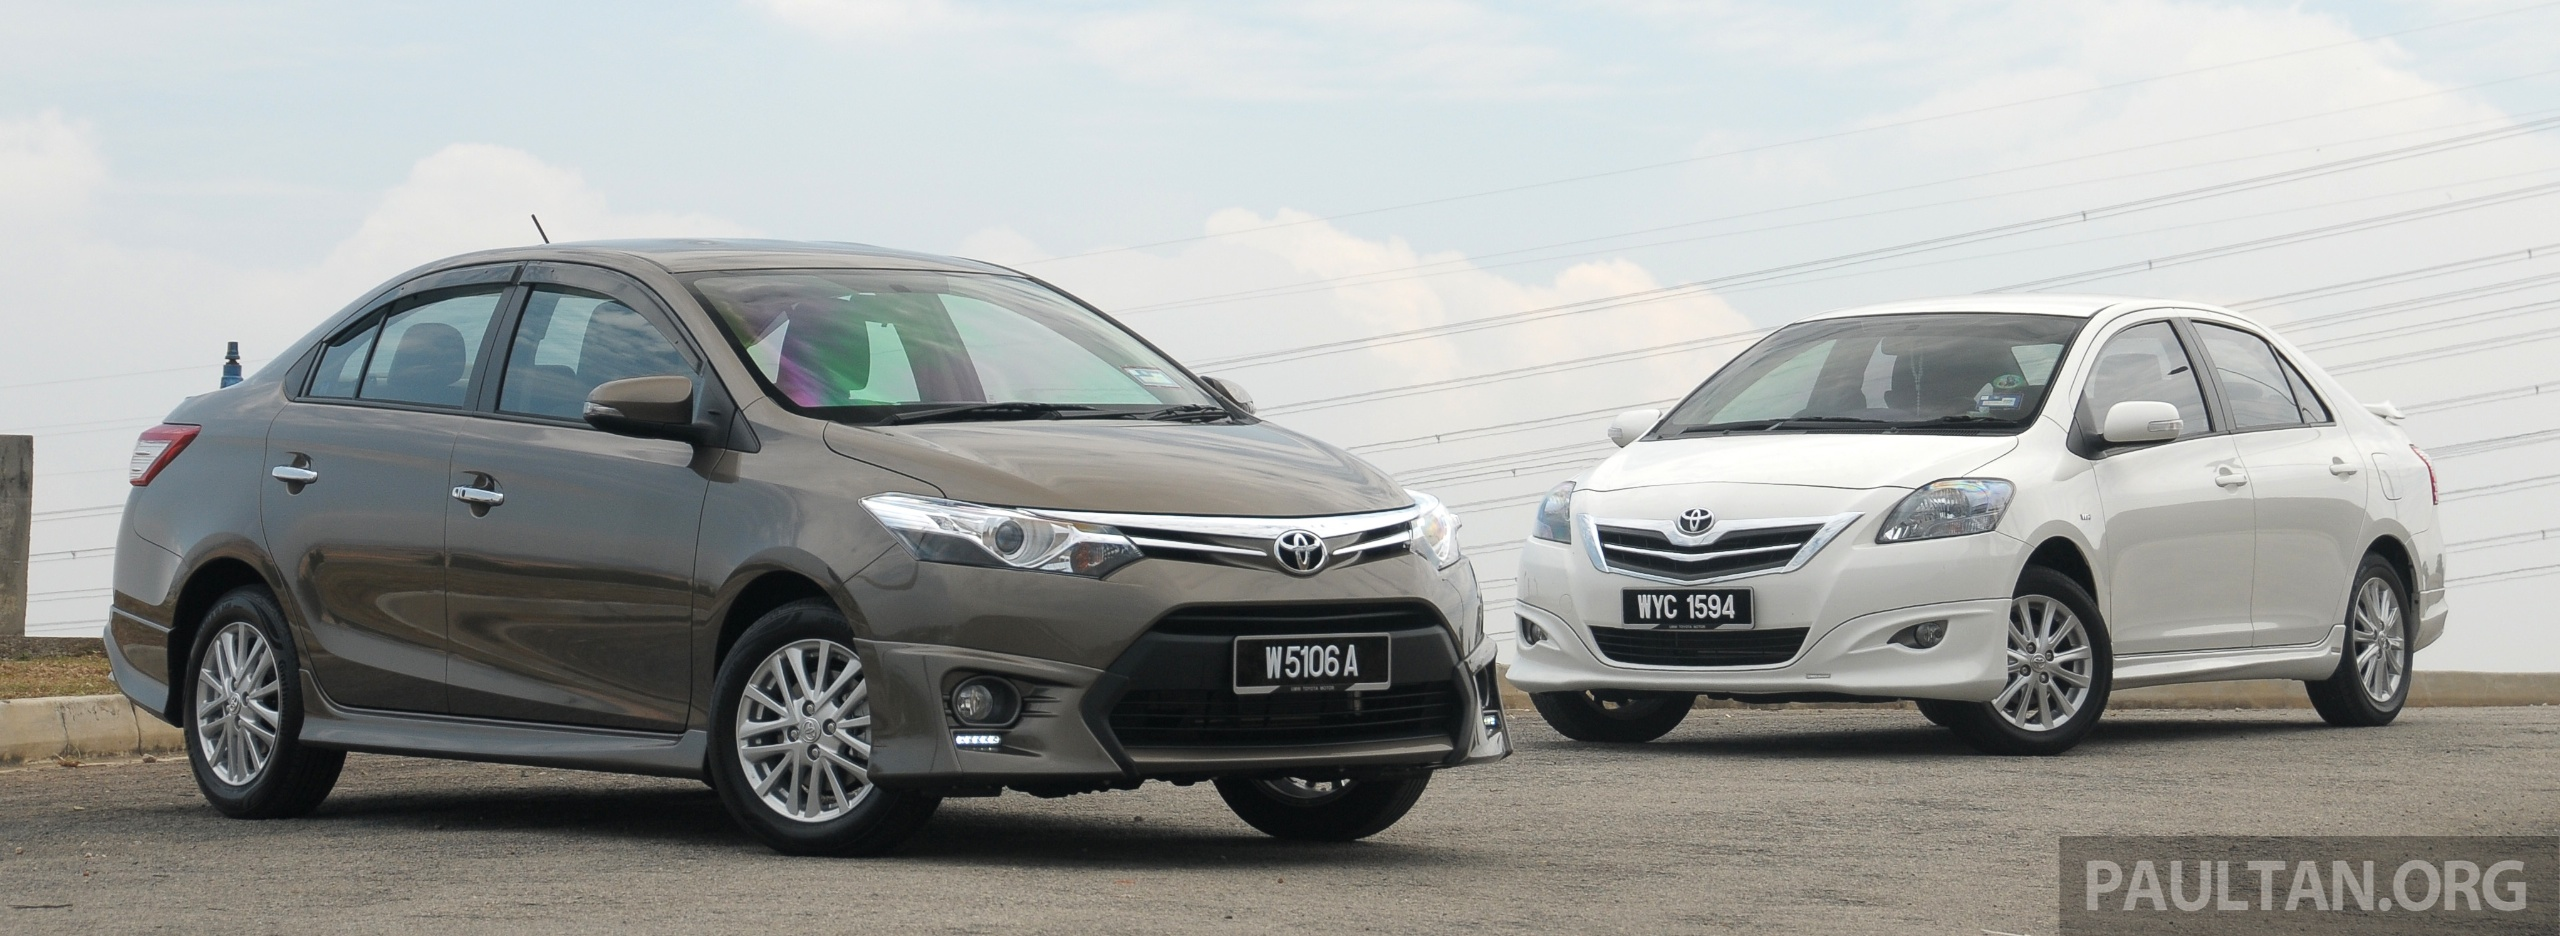 New Toyota Vios 2014